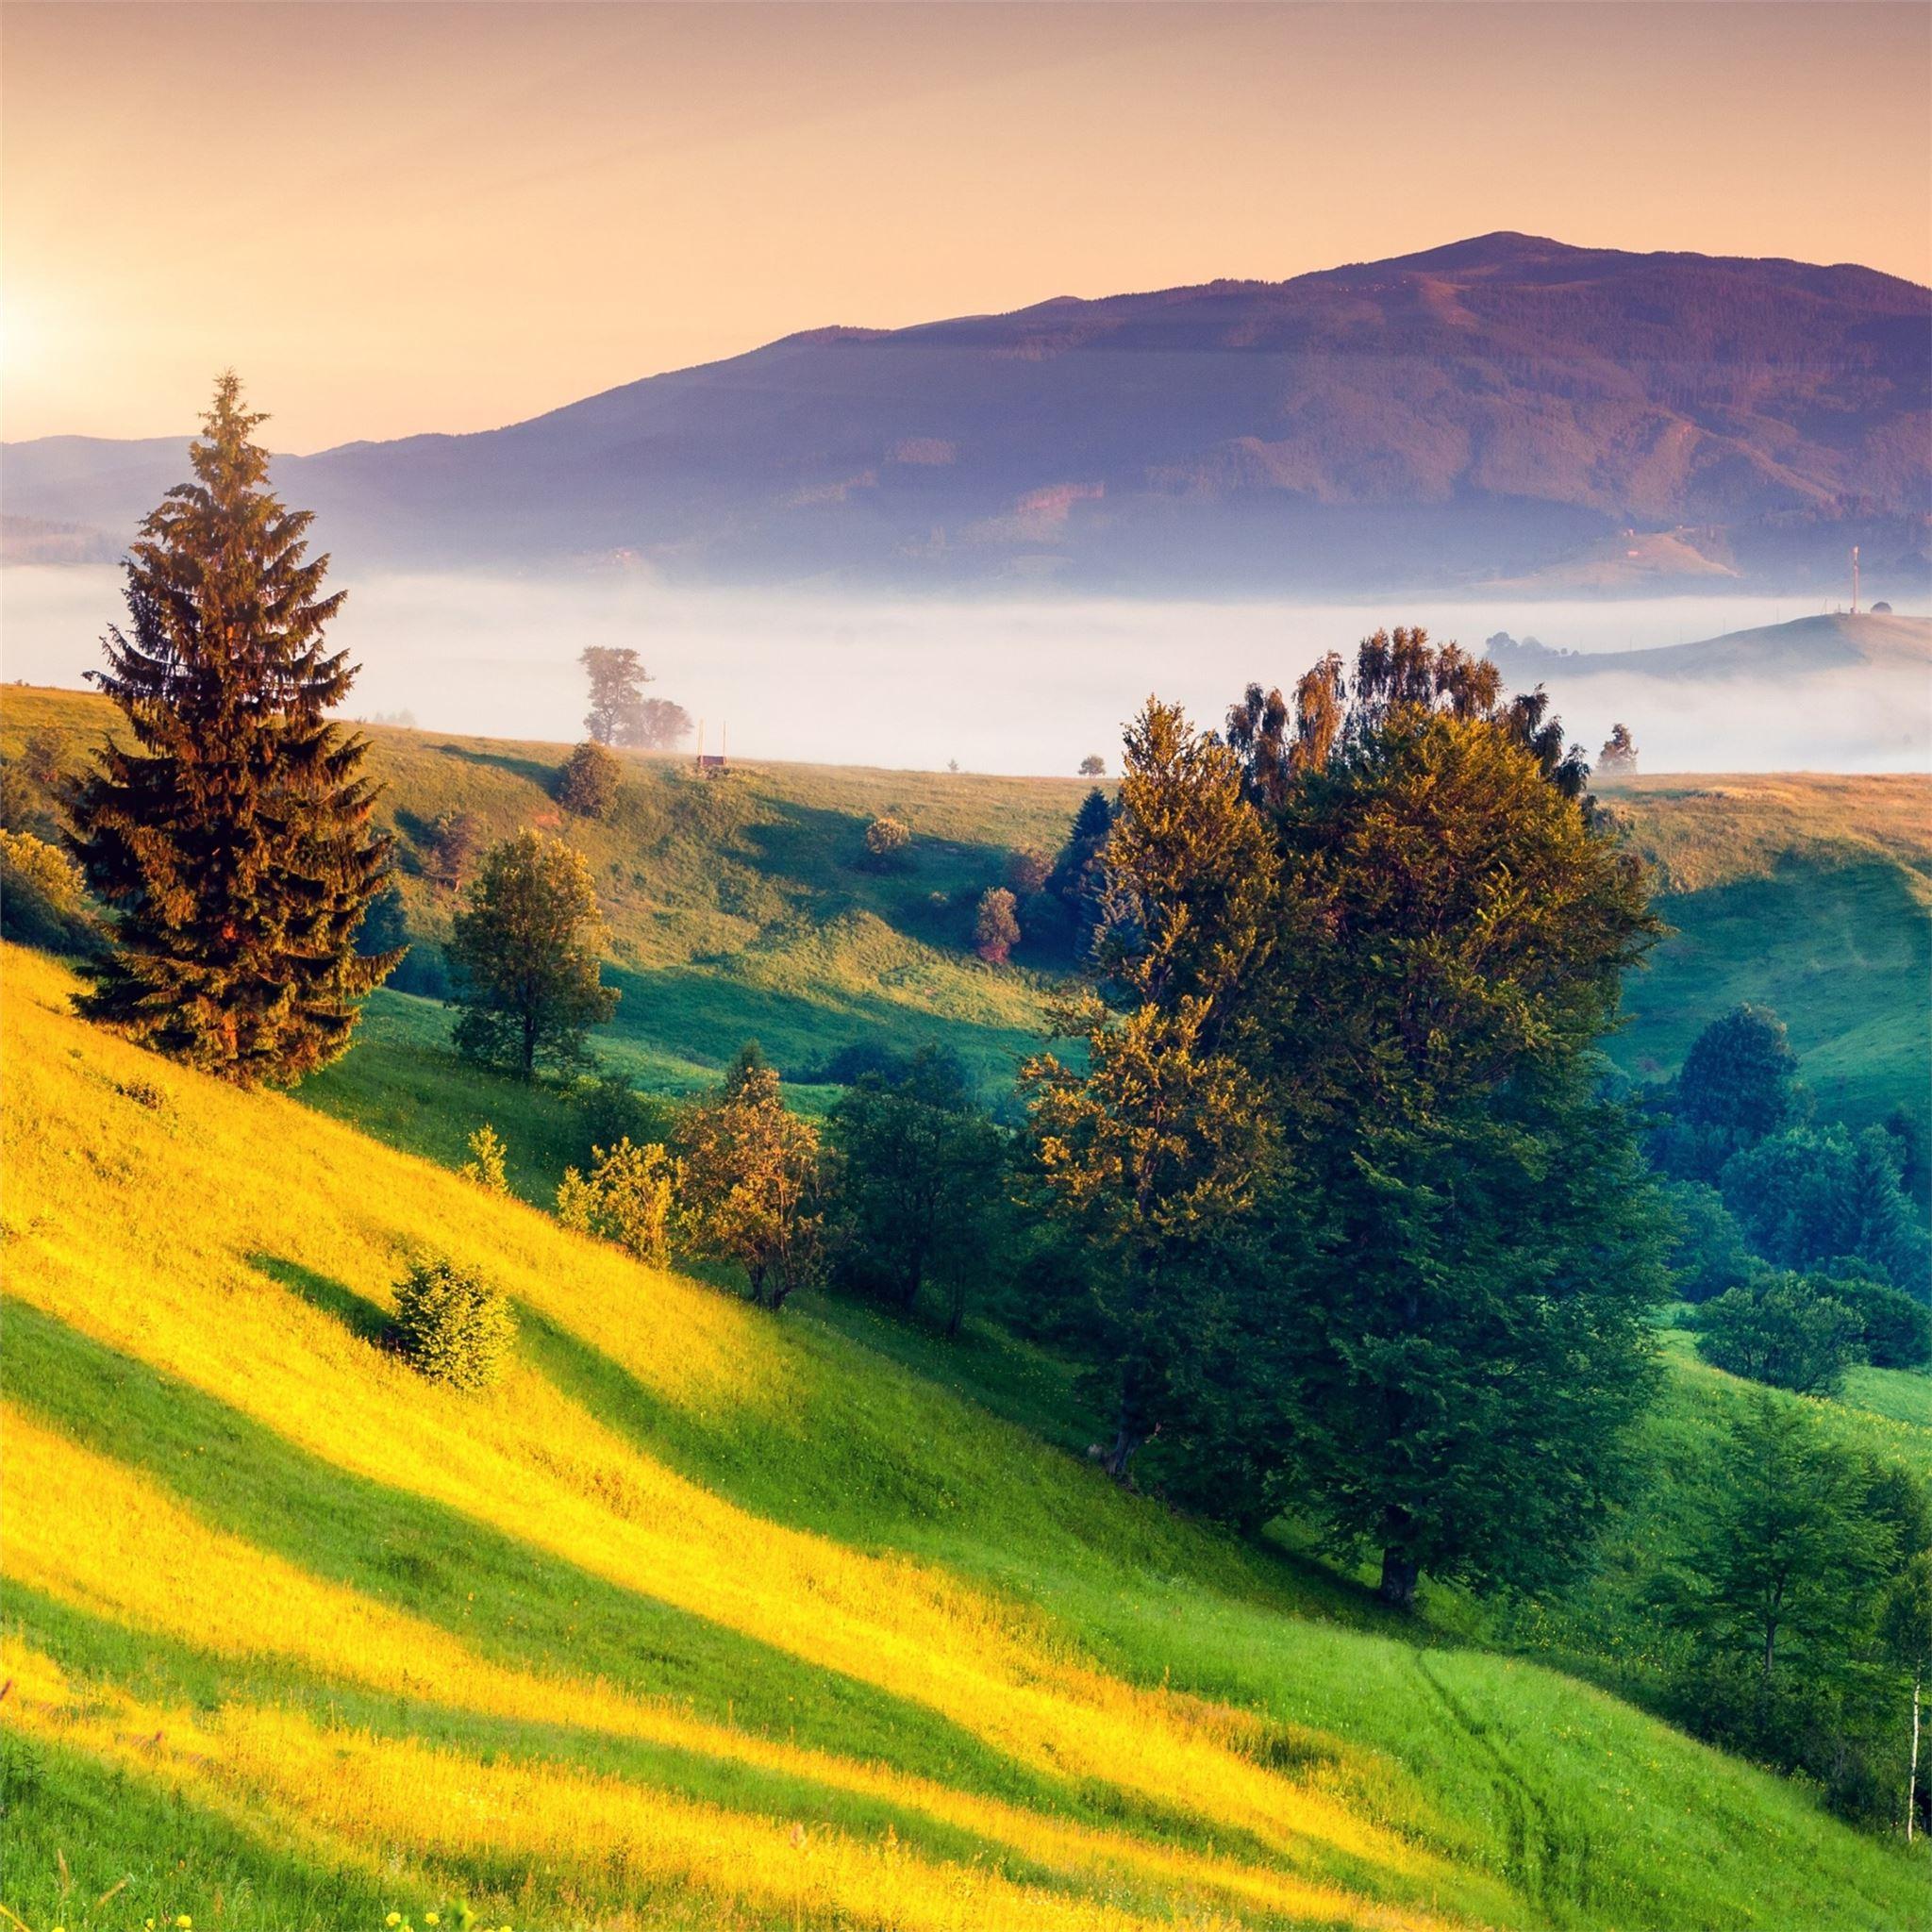 Landscape Beautiful 4k Ipad Pro Wallpapers Free Download